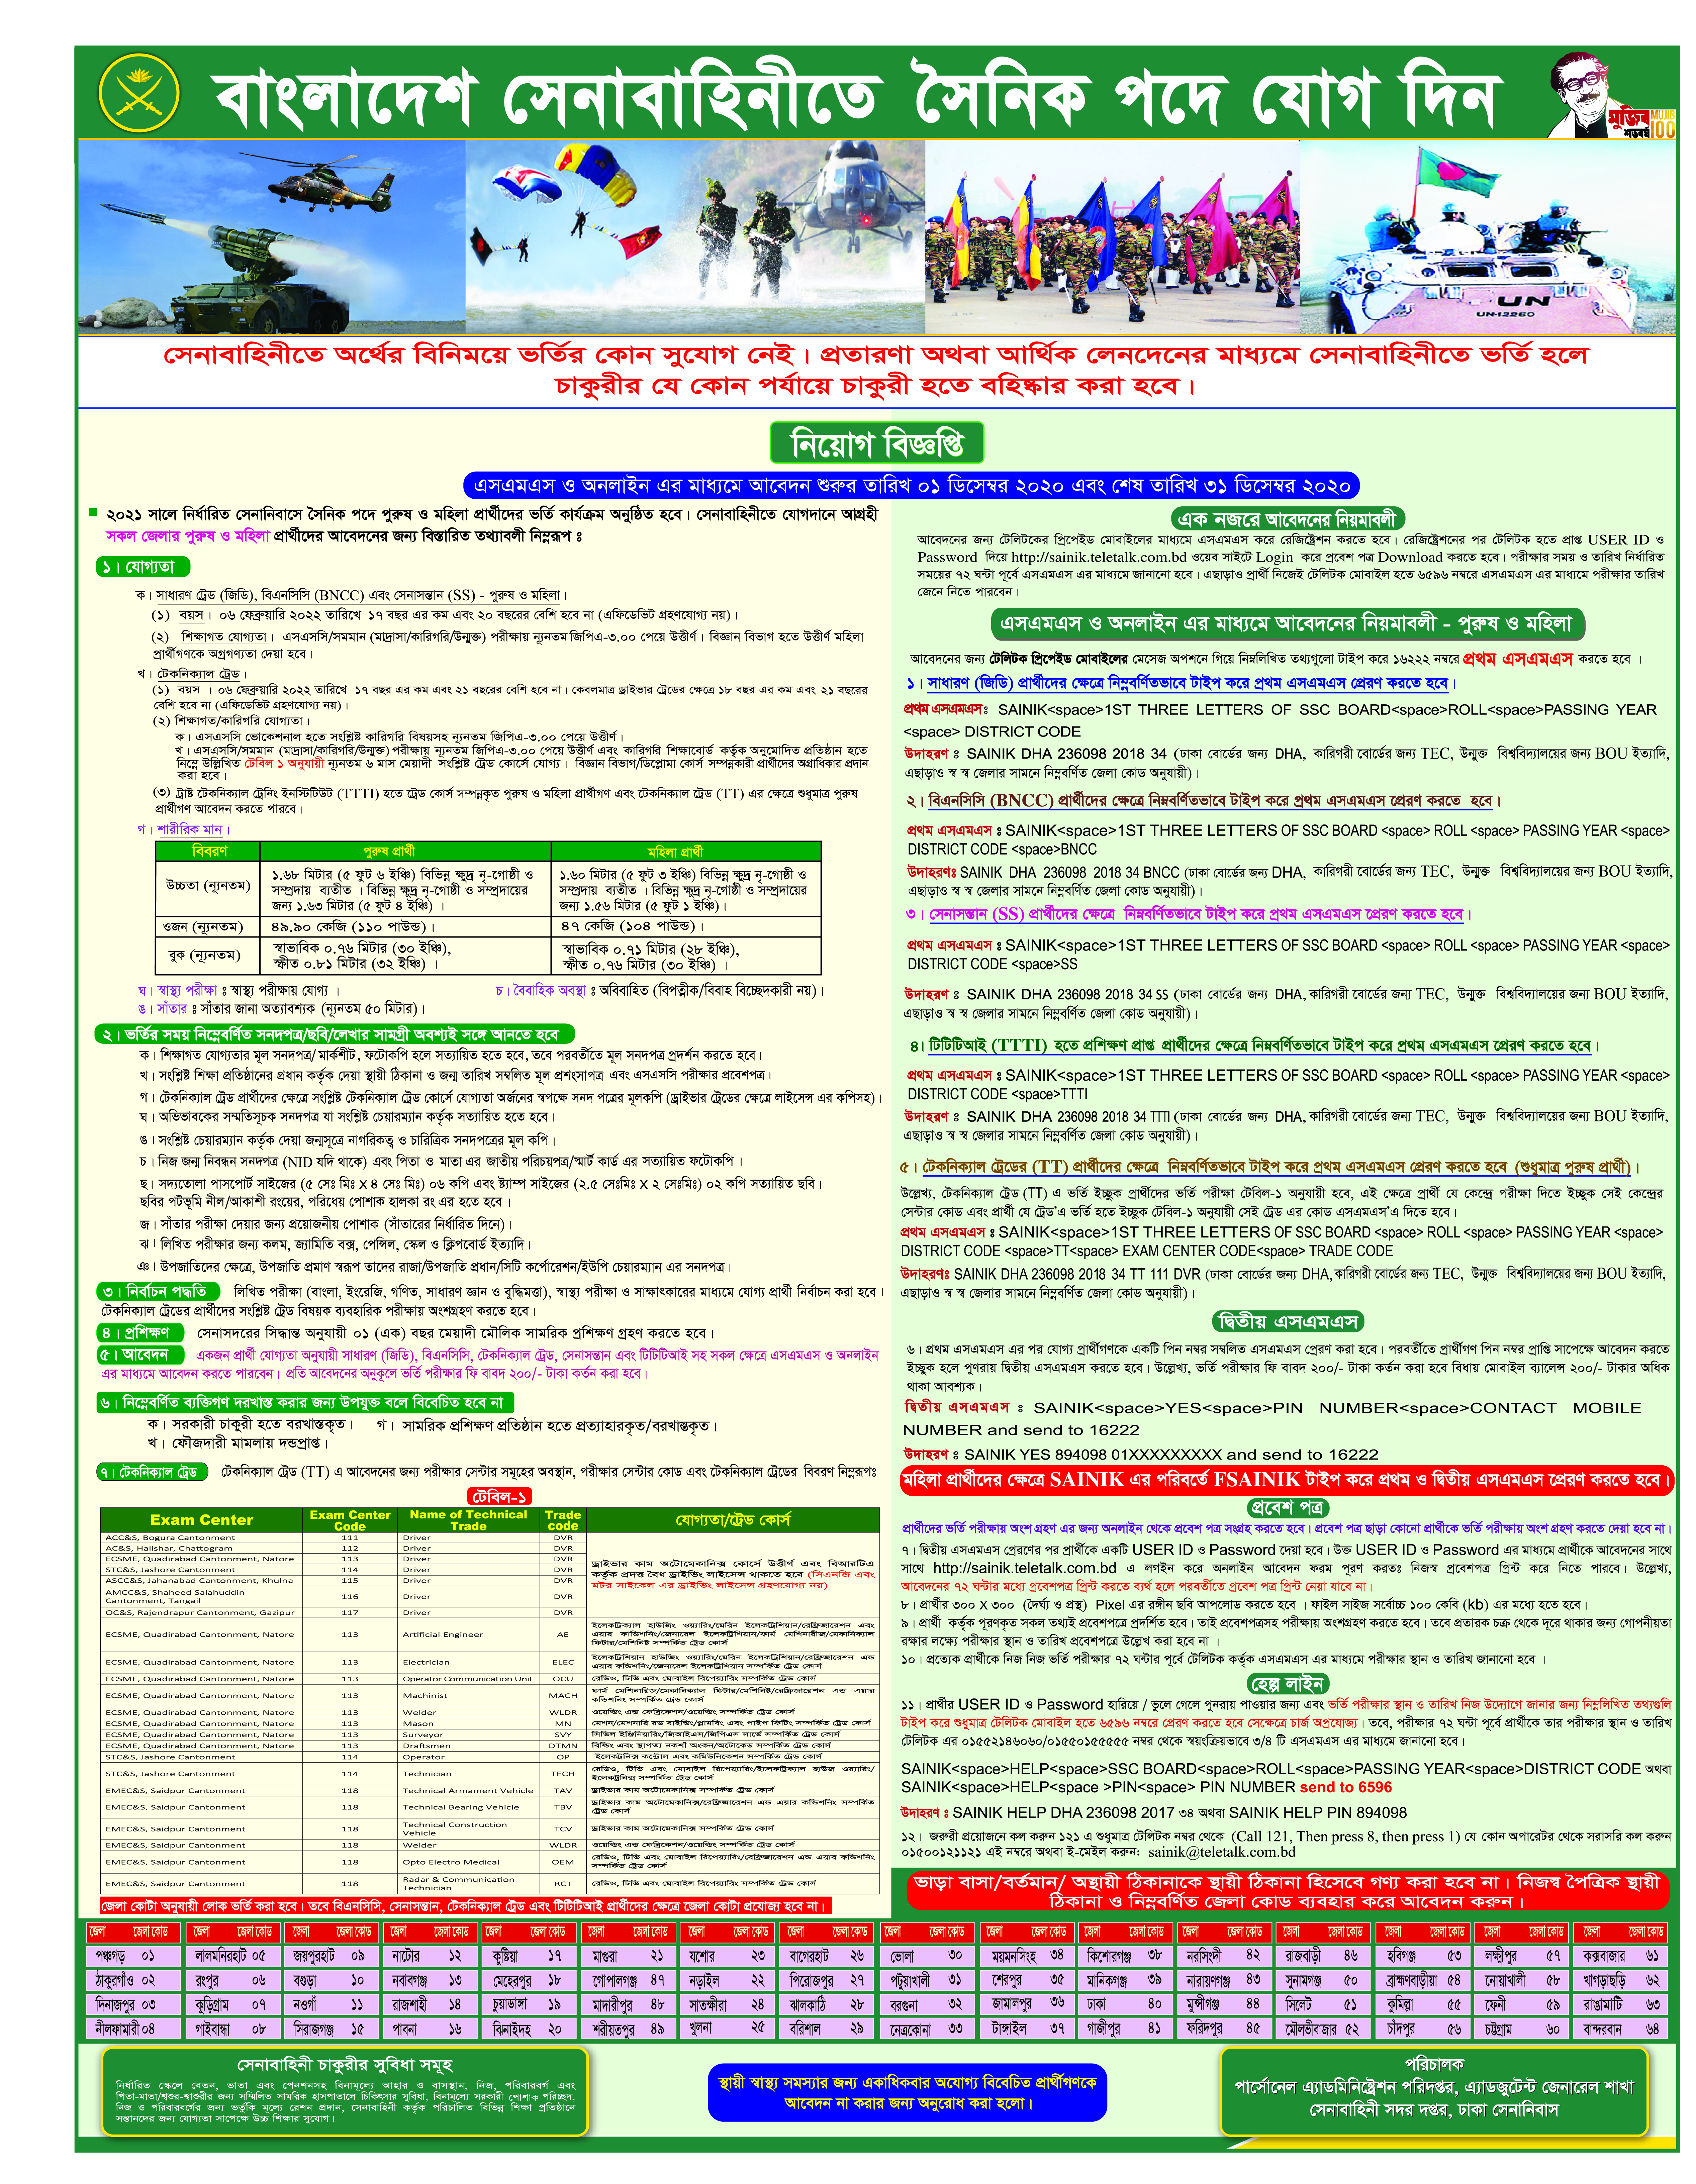 Bangladesh Army Sainik Recruitment Circular 2021